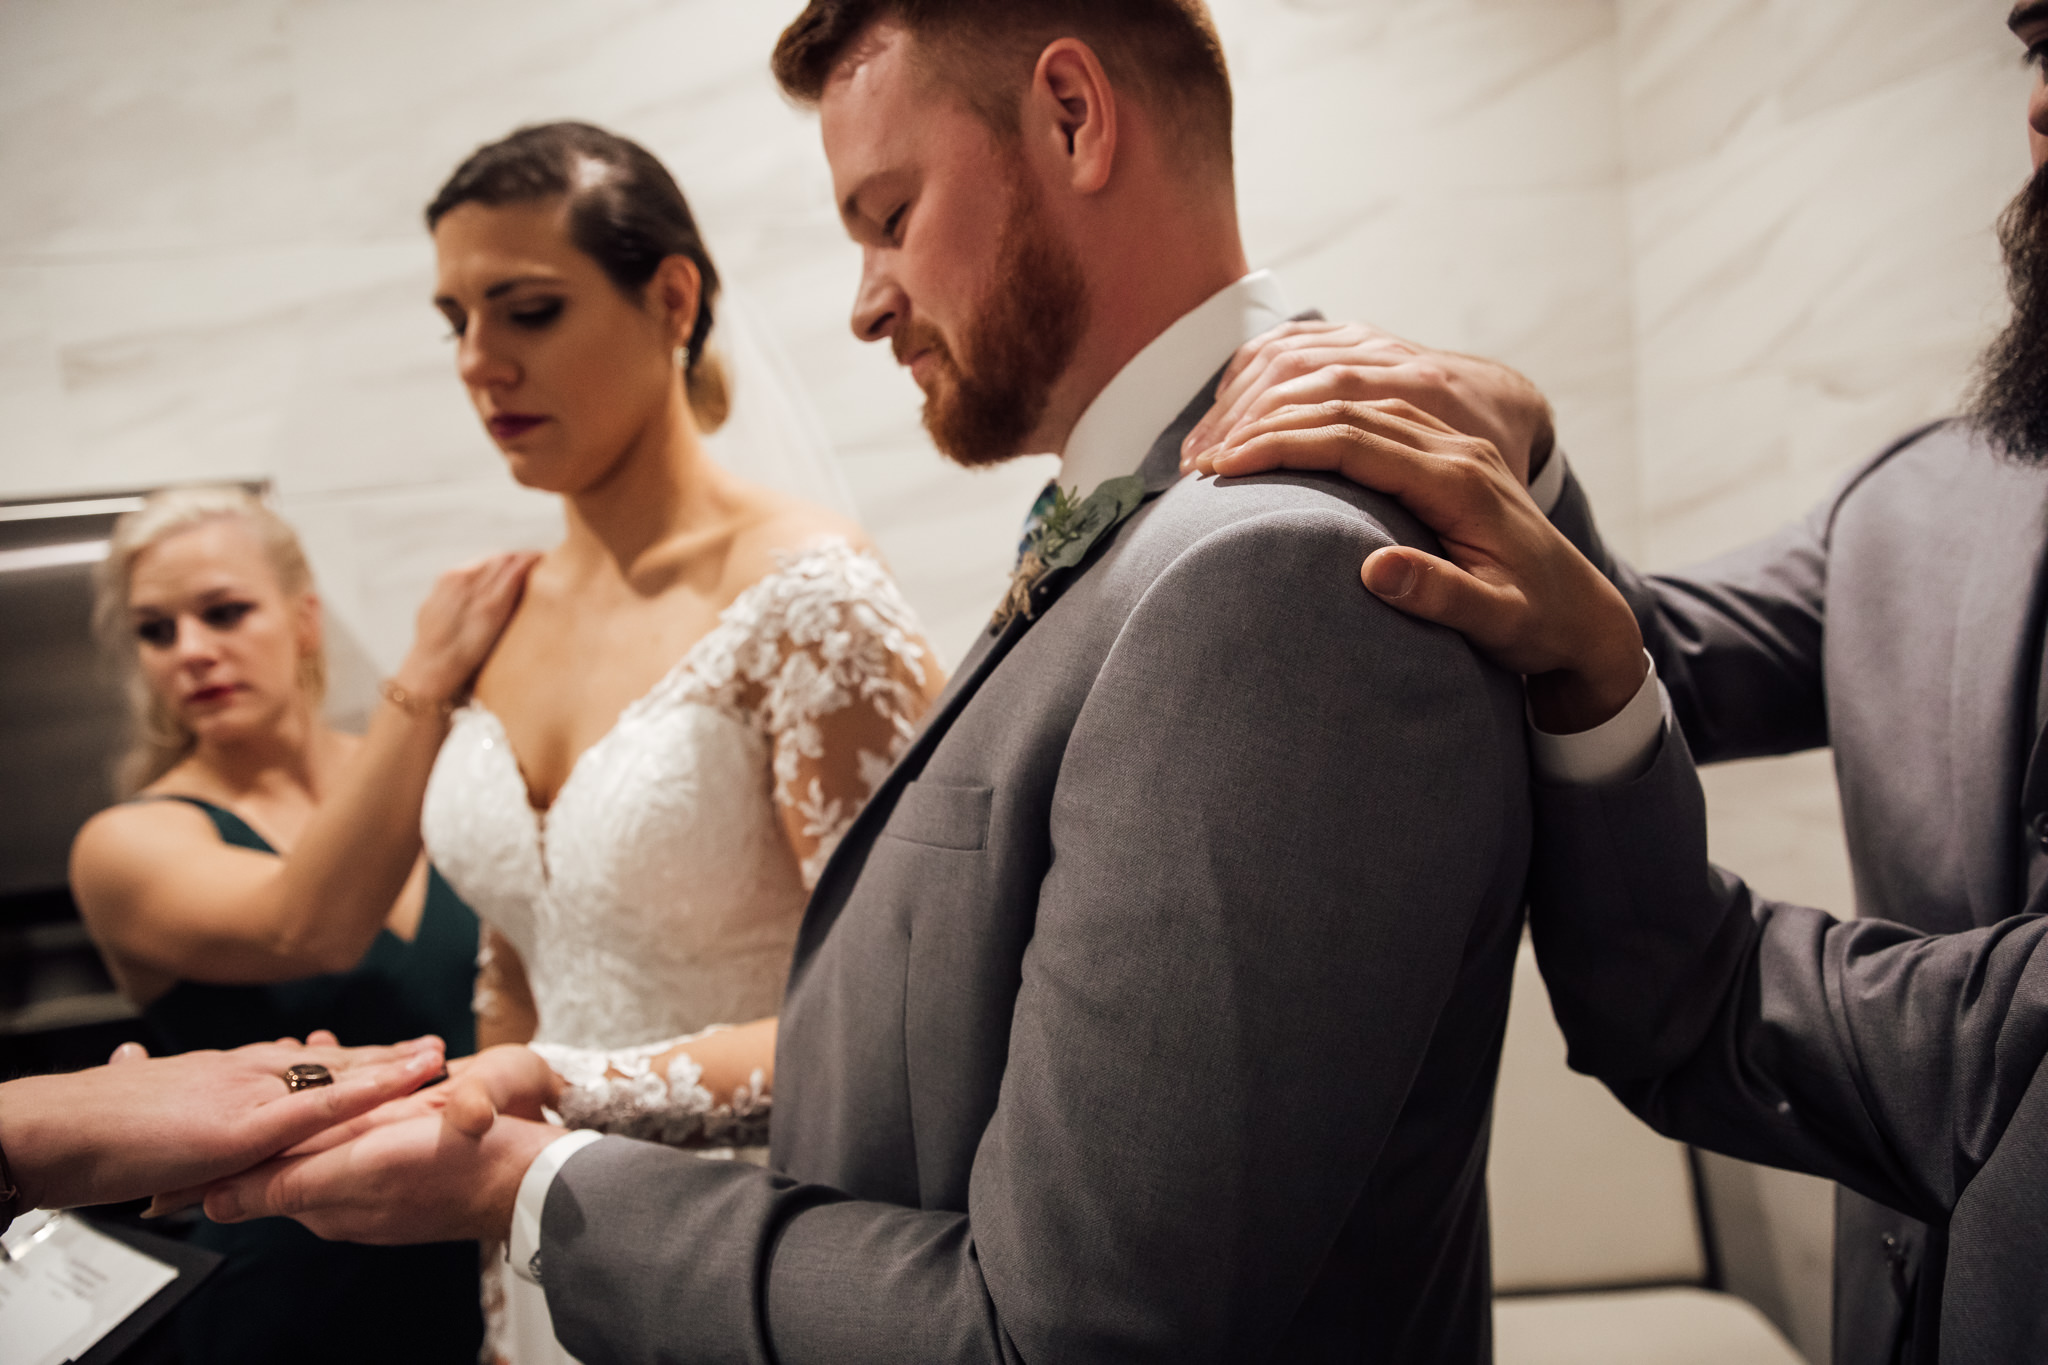 phantom-canyon-brewery-colorado-springs-wedding-photographer-124.jpg